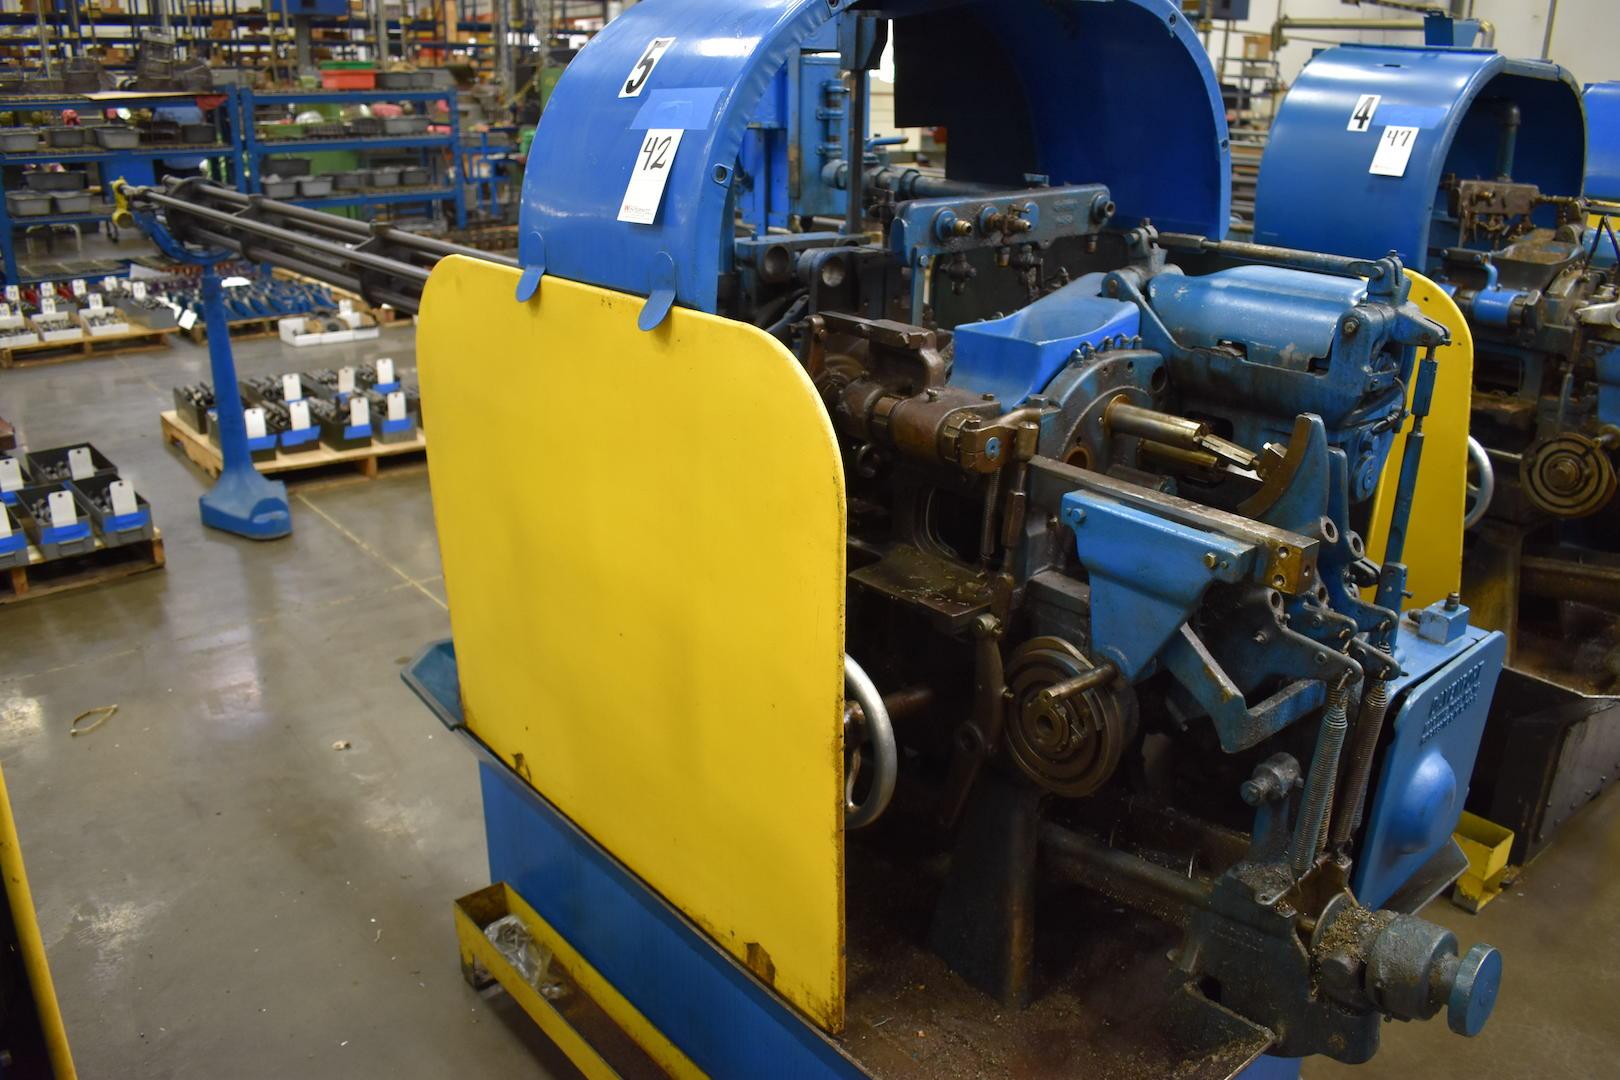 Lot 42 - DAVENPORT MODEL B OVERSIZE 5-SPINDLE AUTOMATIC SCREW MACHINE